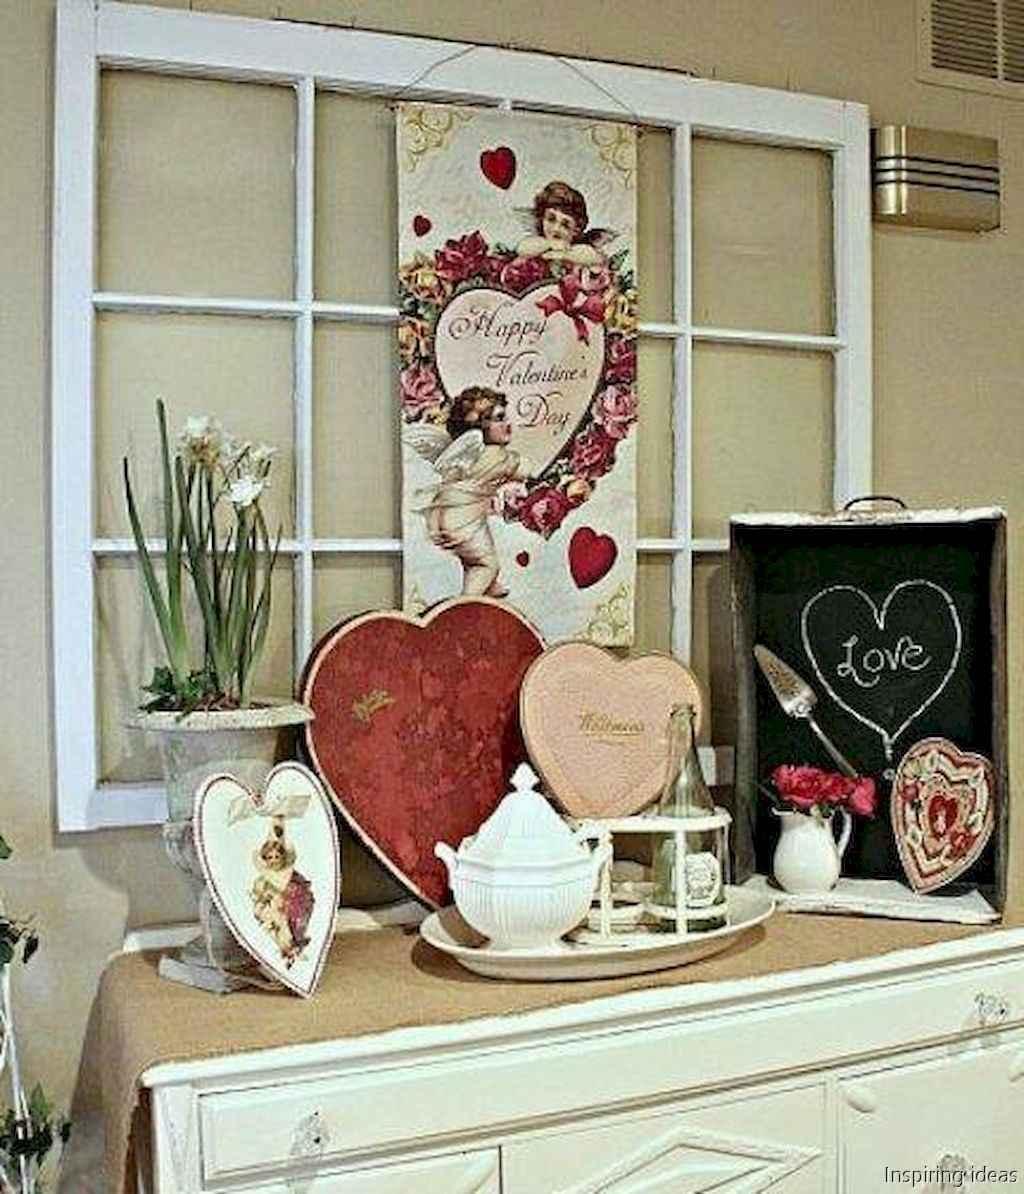 11 beautiful vintage valentine decorations ideas